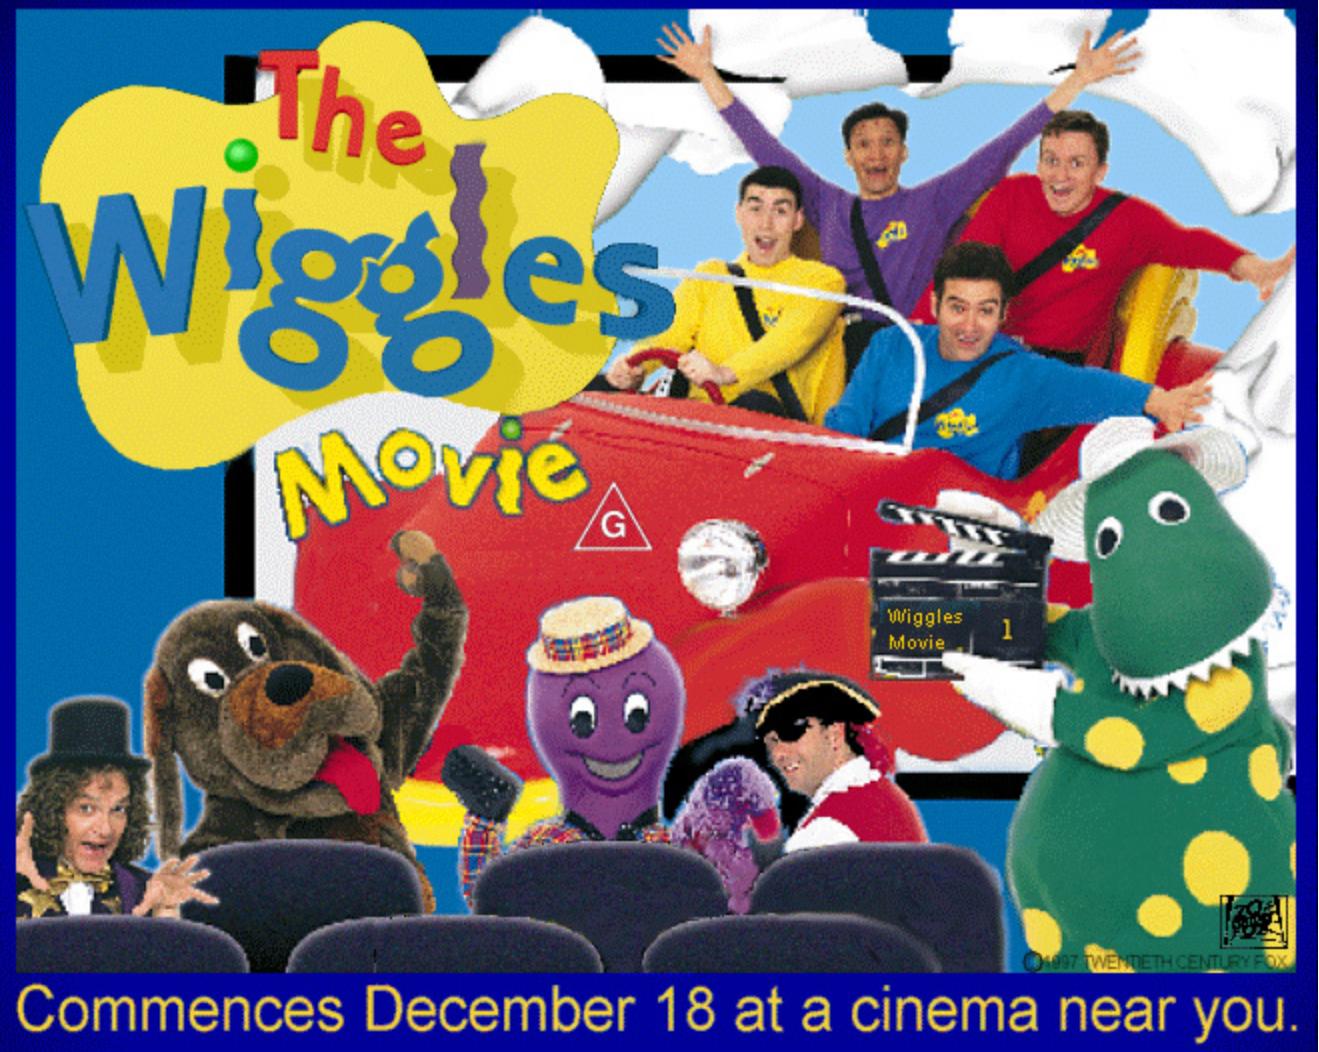 The Wiggles Movie/Marketing